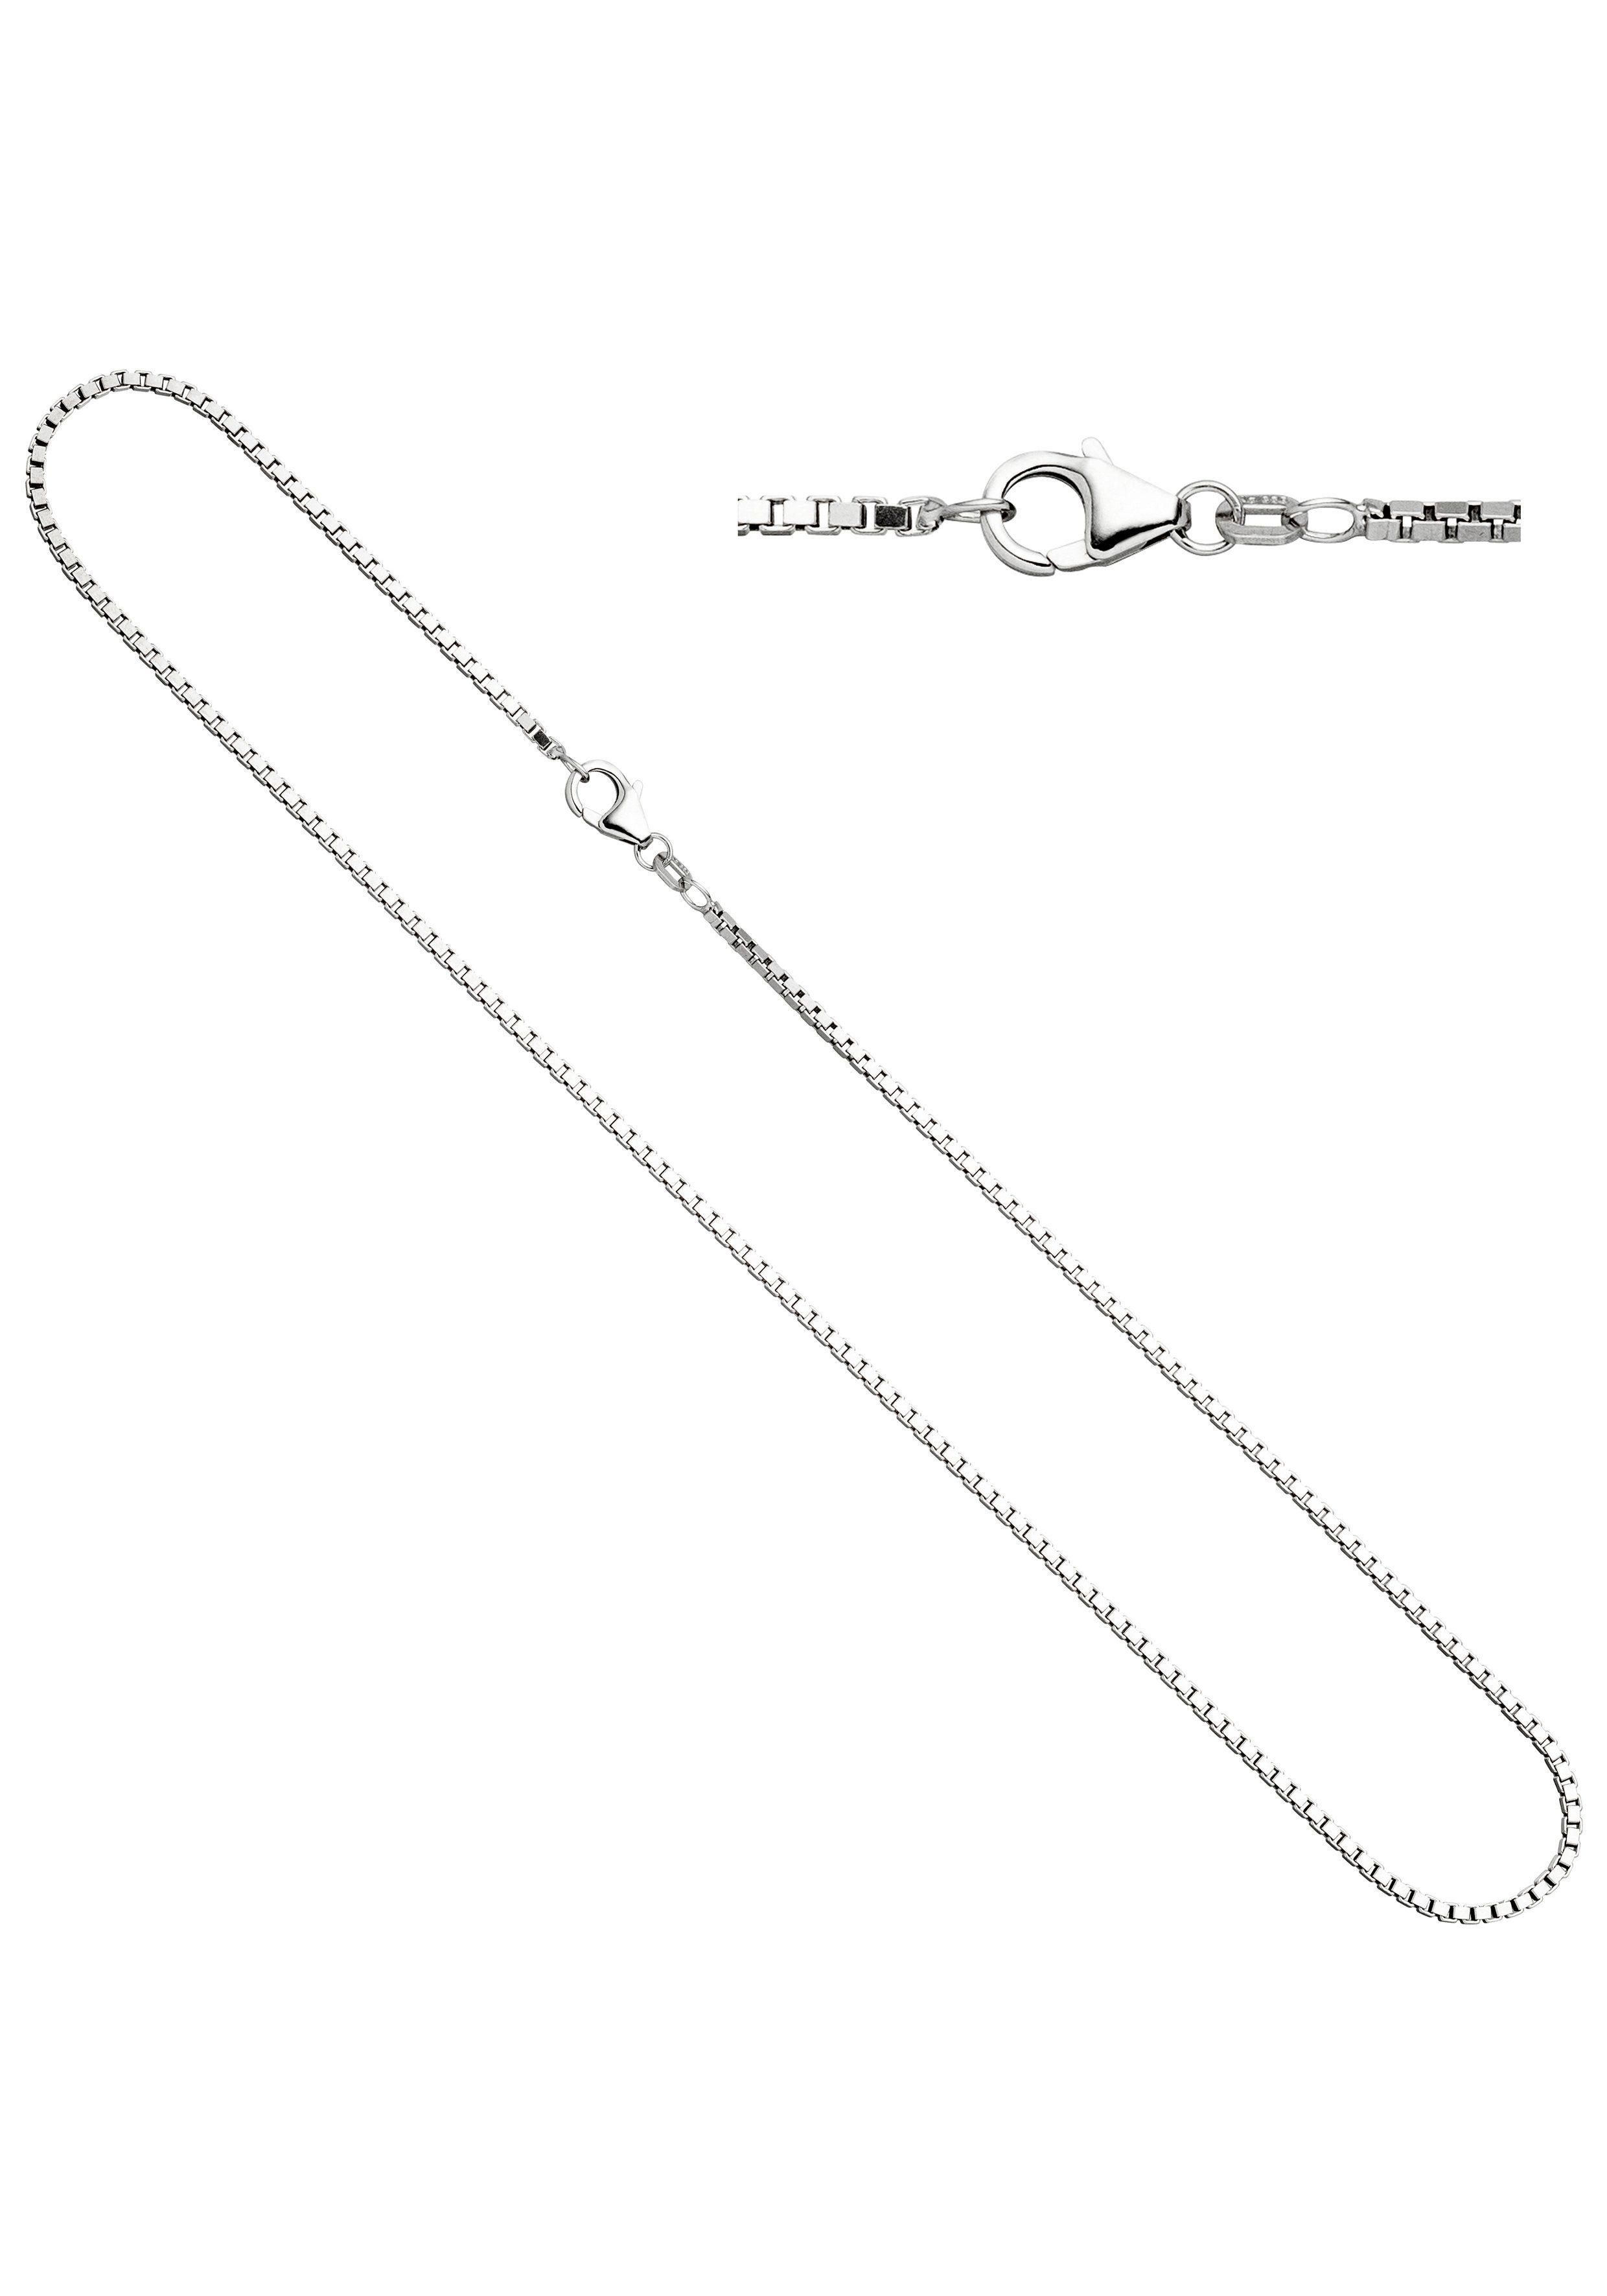 JOBO Silberkette Venezianerkette 925 Silber 50 cm 1,2 mm